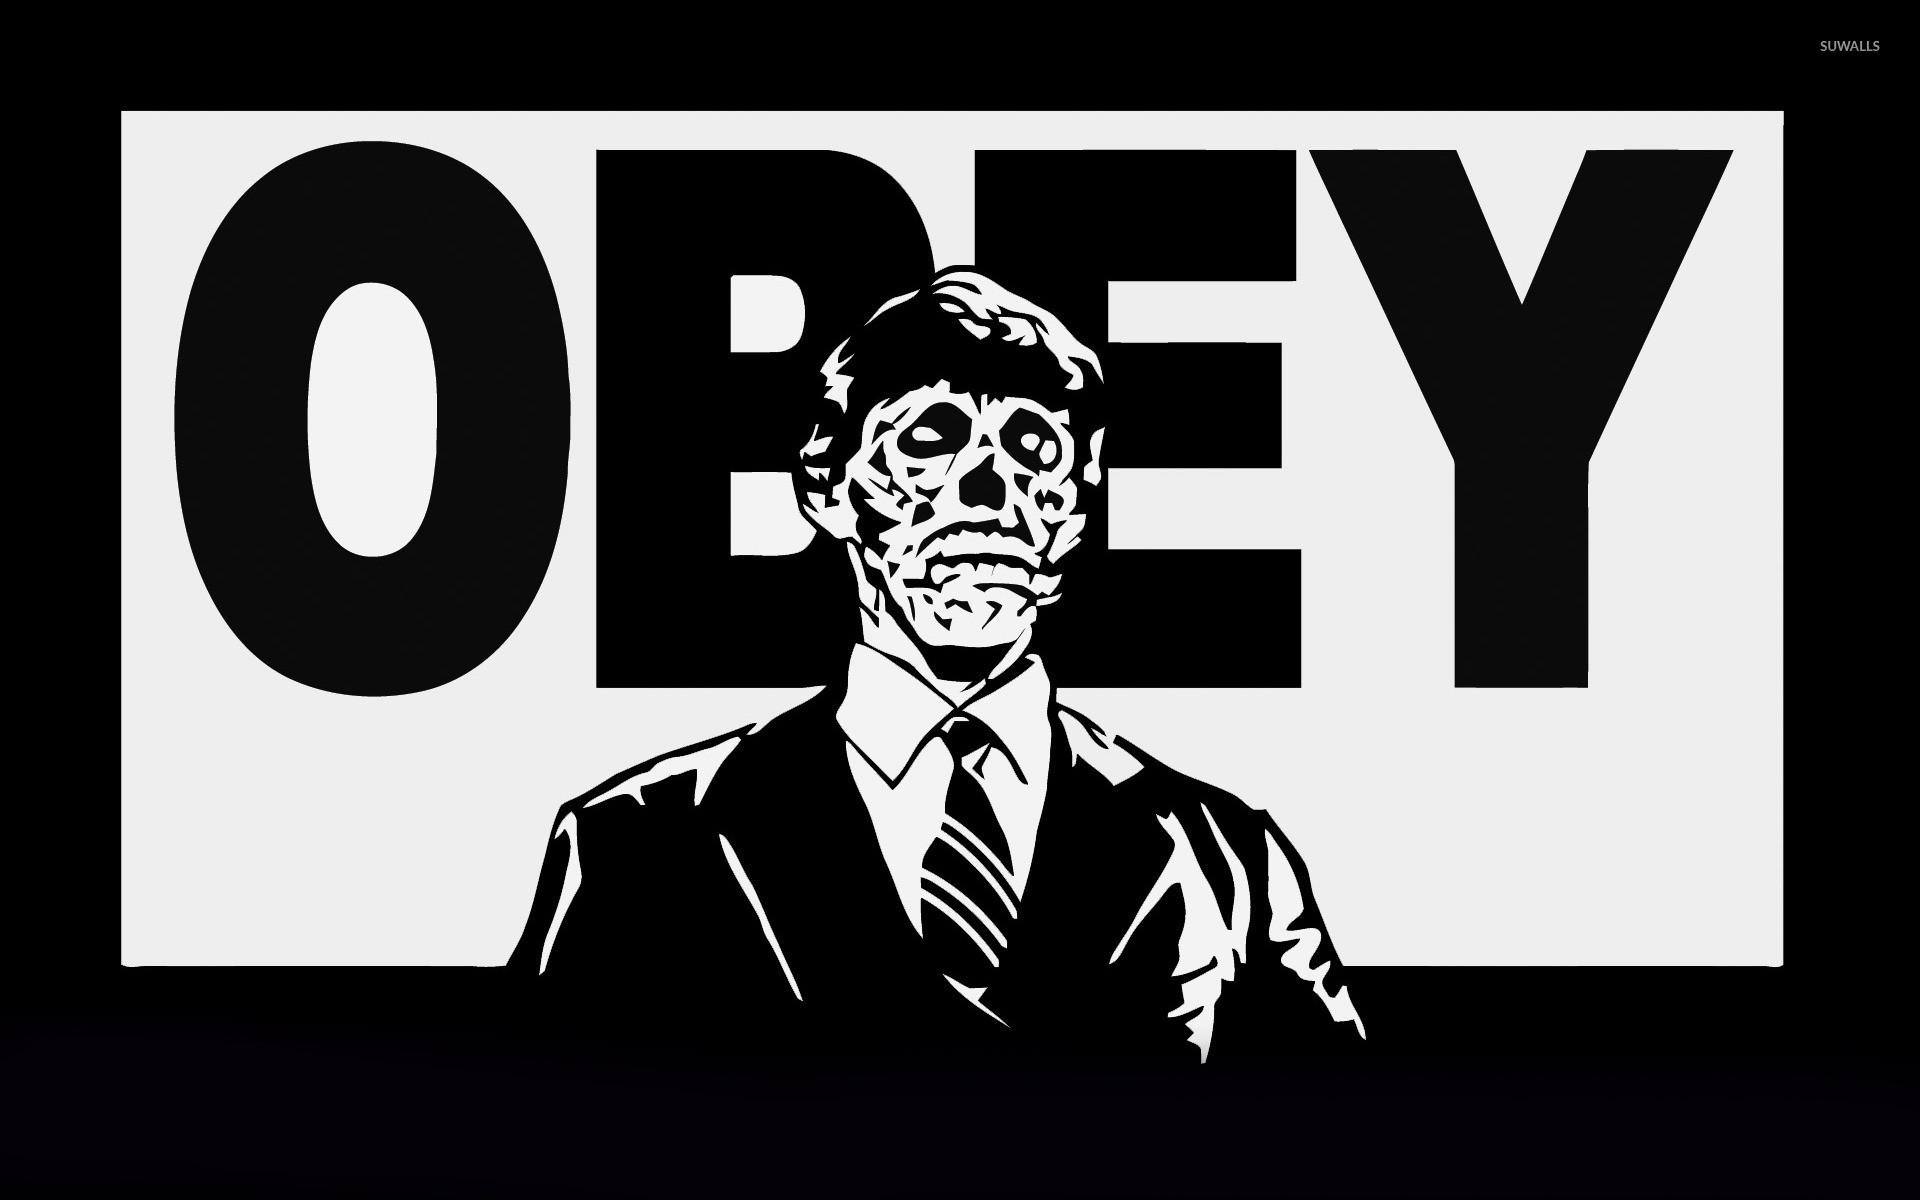 1920x1200 zombie obey wallpaper